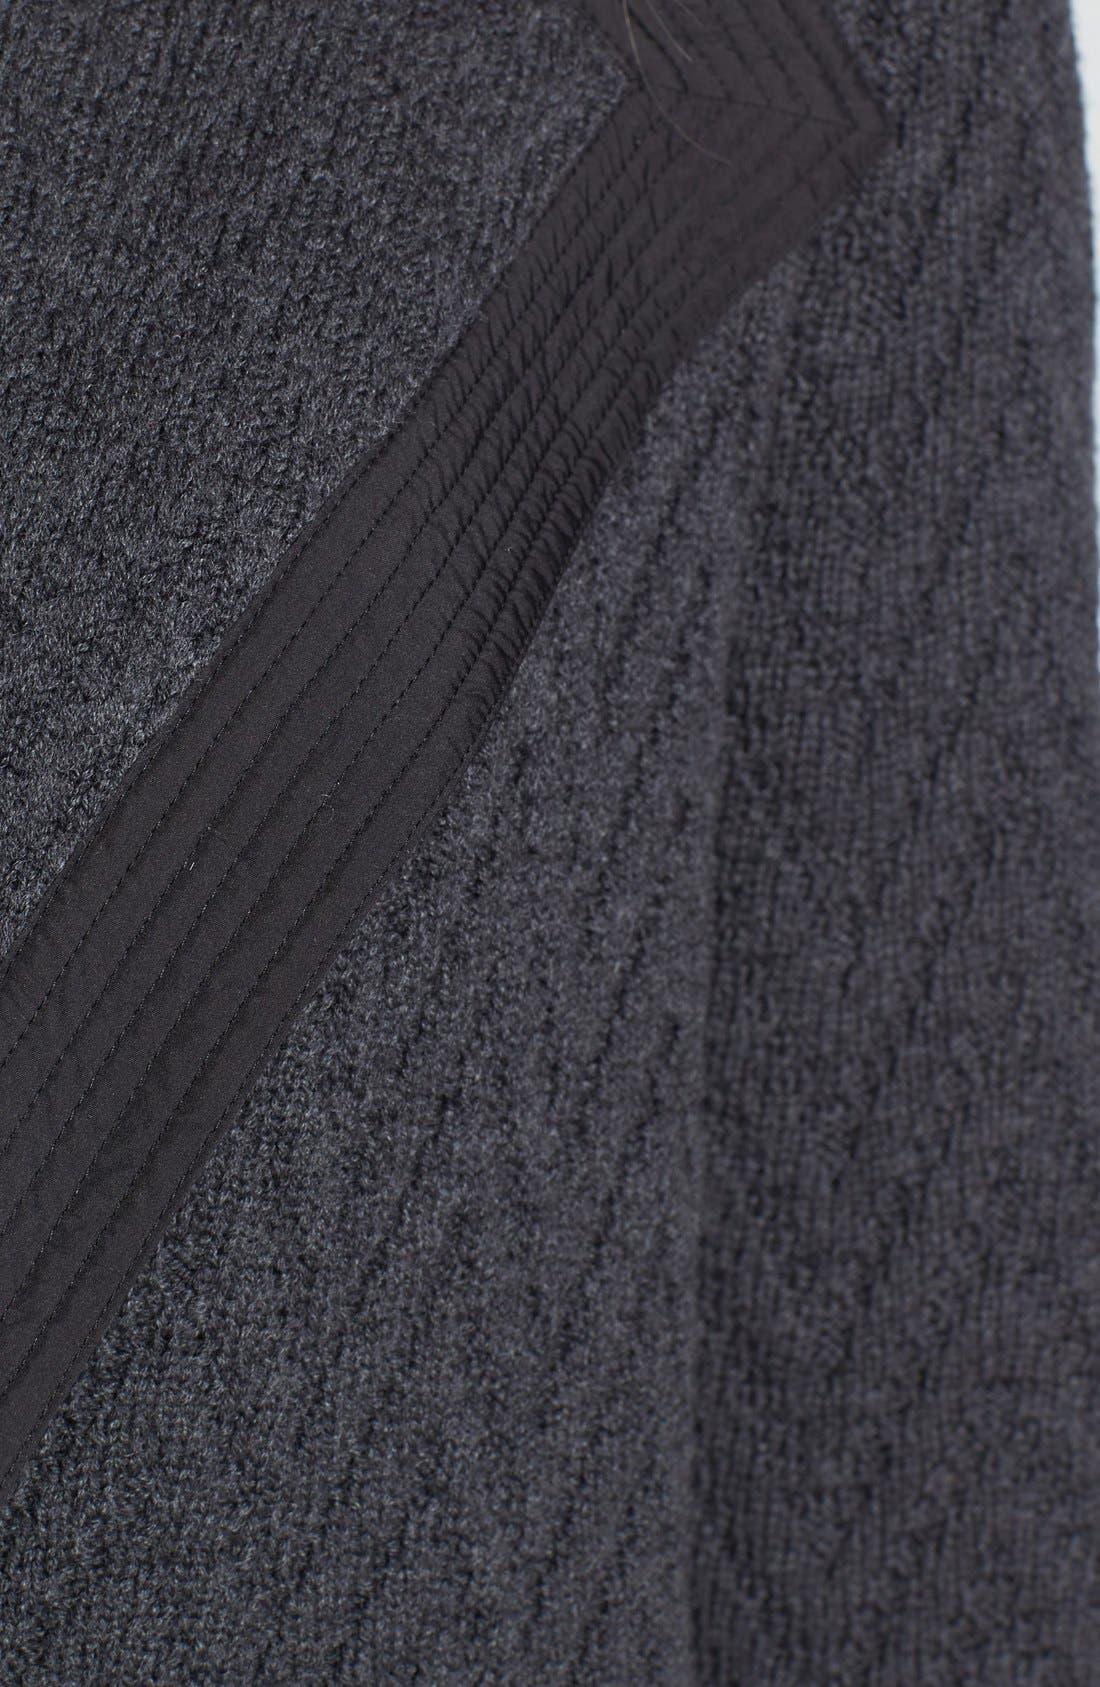 Alternate Image 3  - Lafayette 148 New York Woven Back Zigzag Merino Wool Cardigan (Regular & Petite)